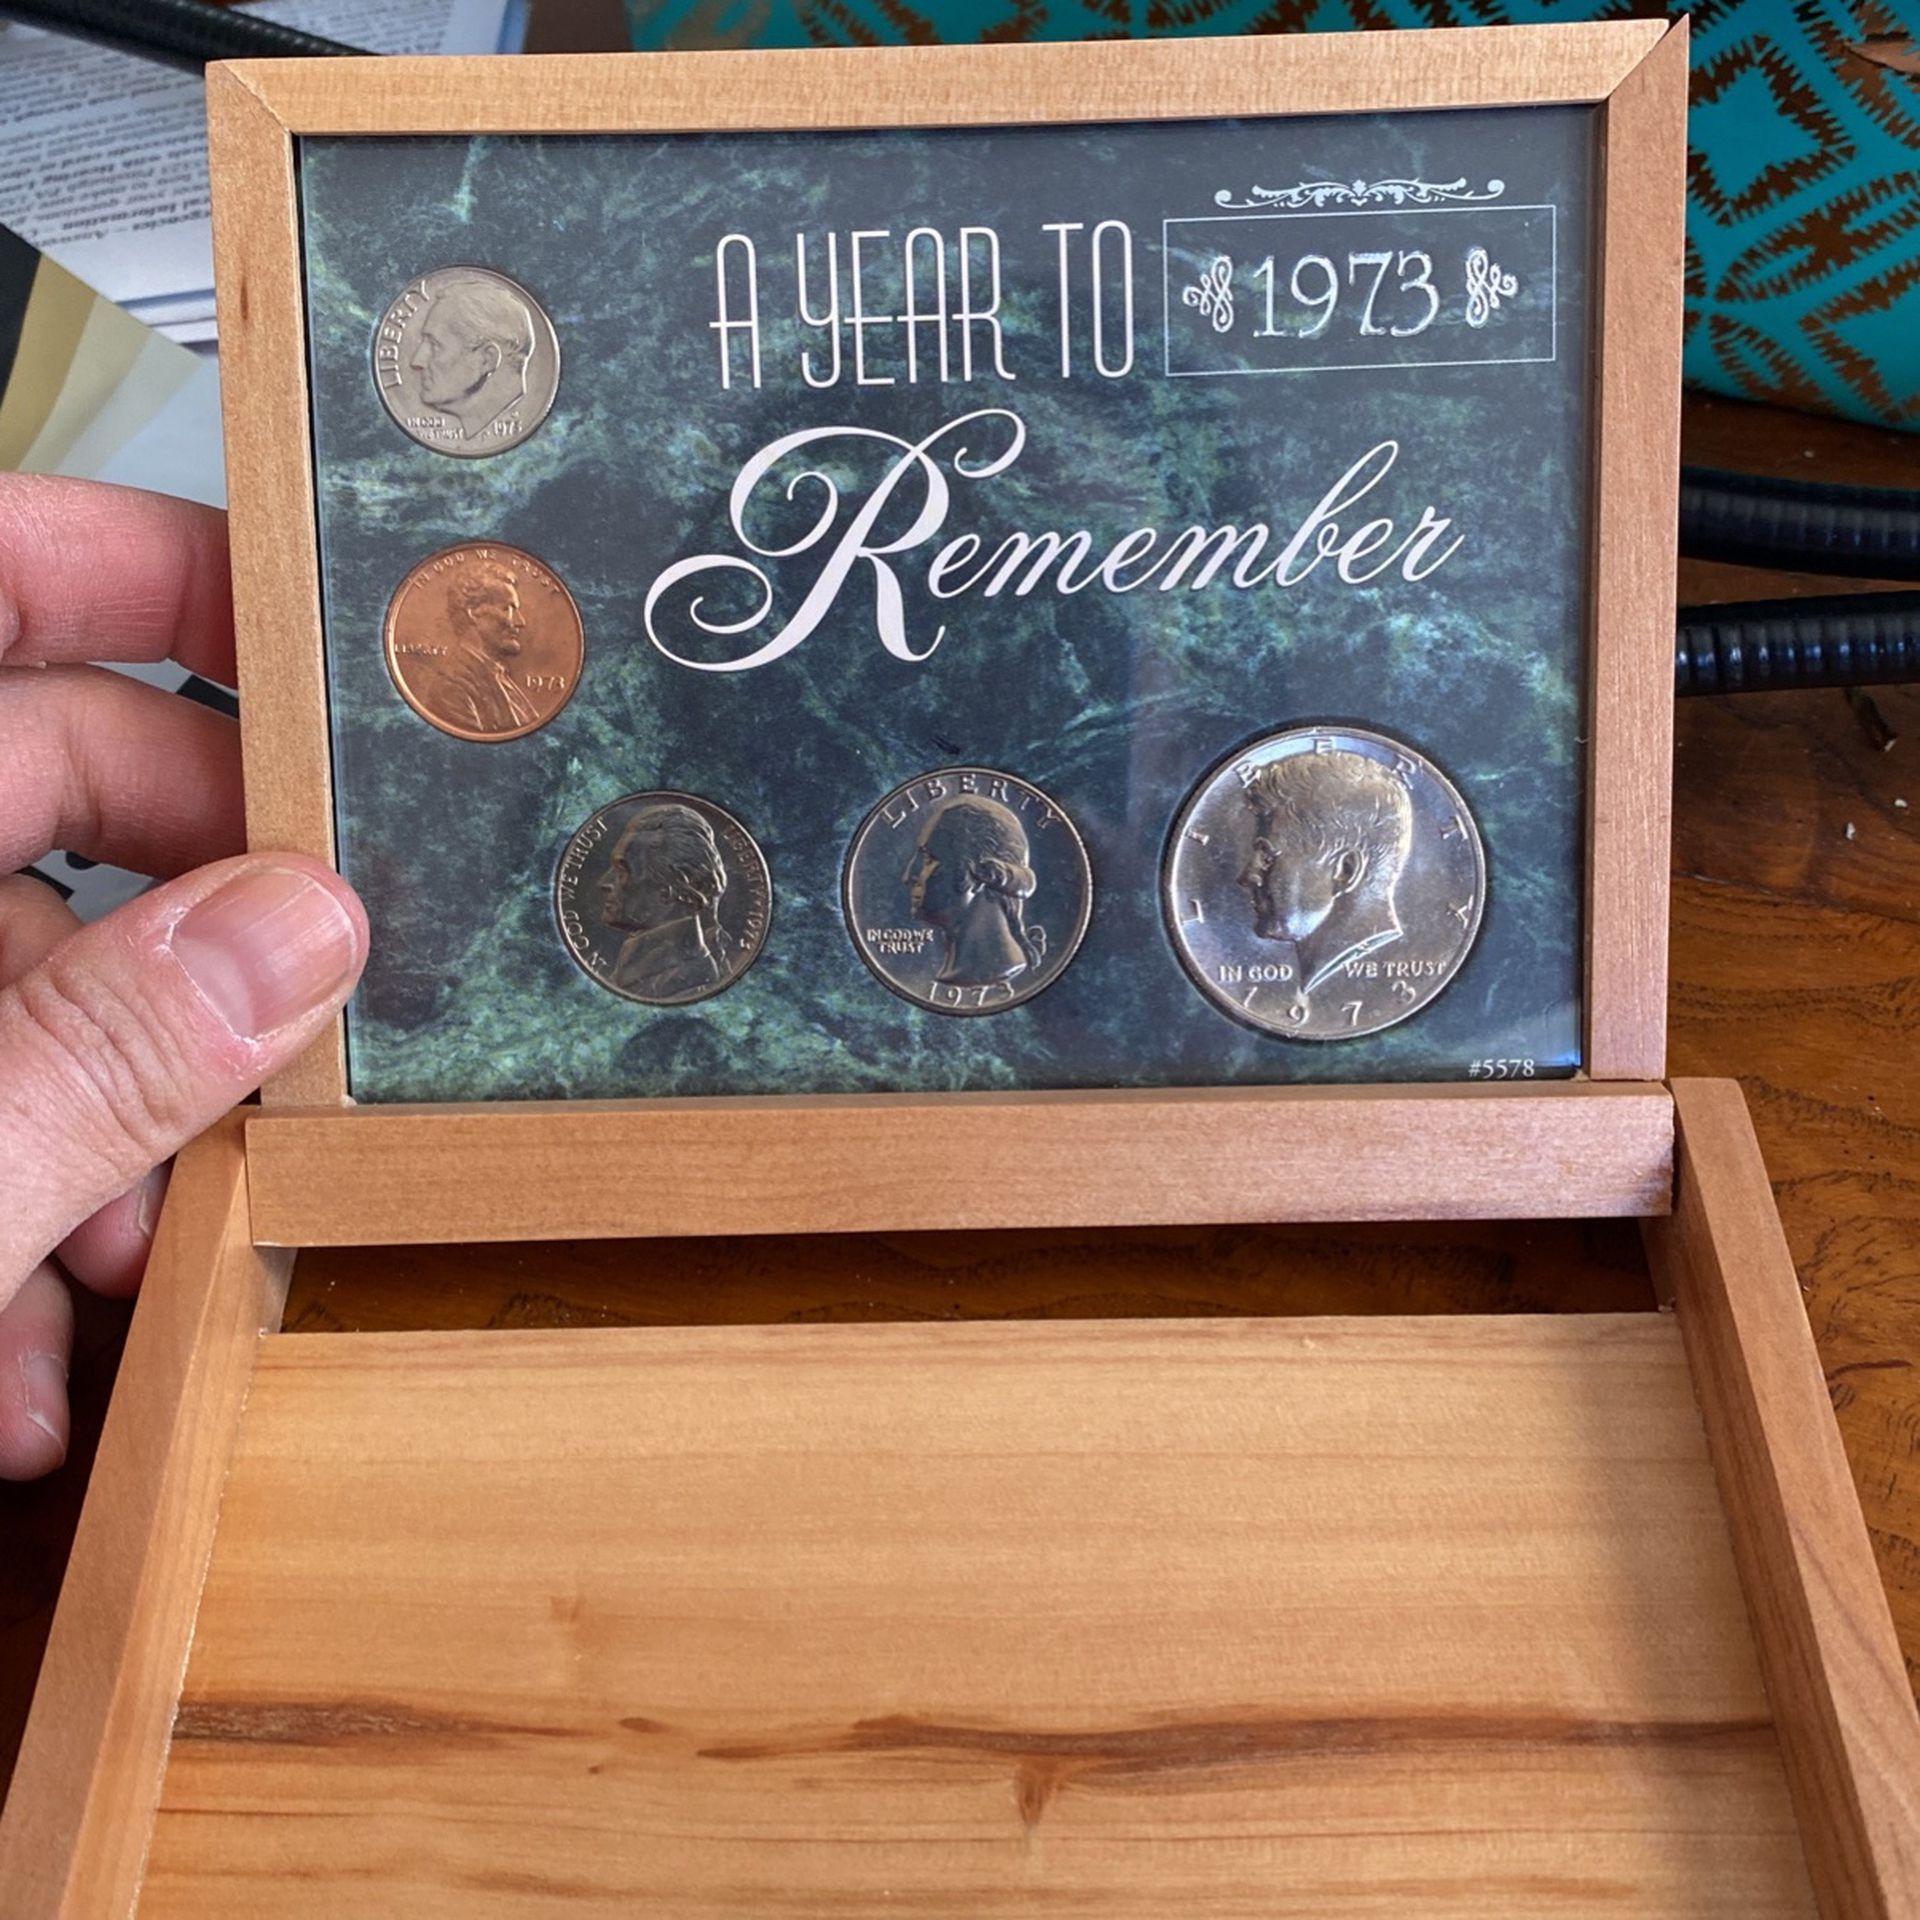 1973 Coin Collection